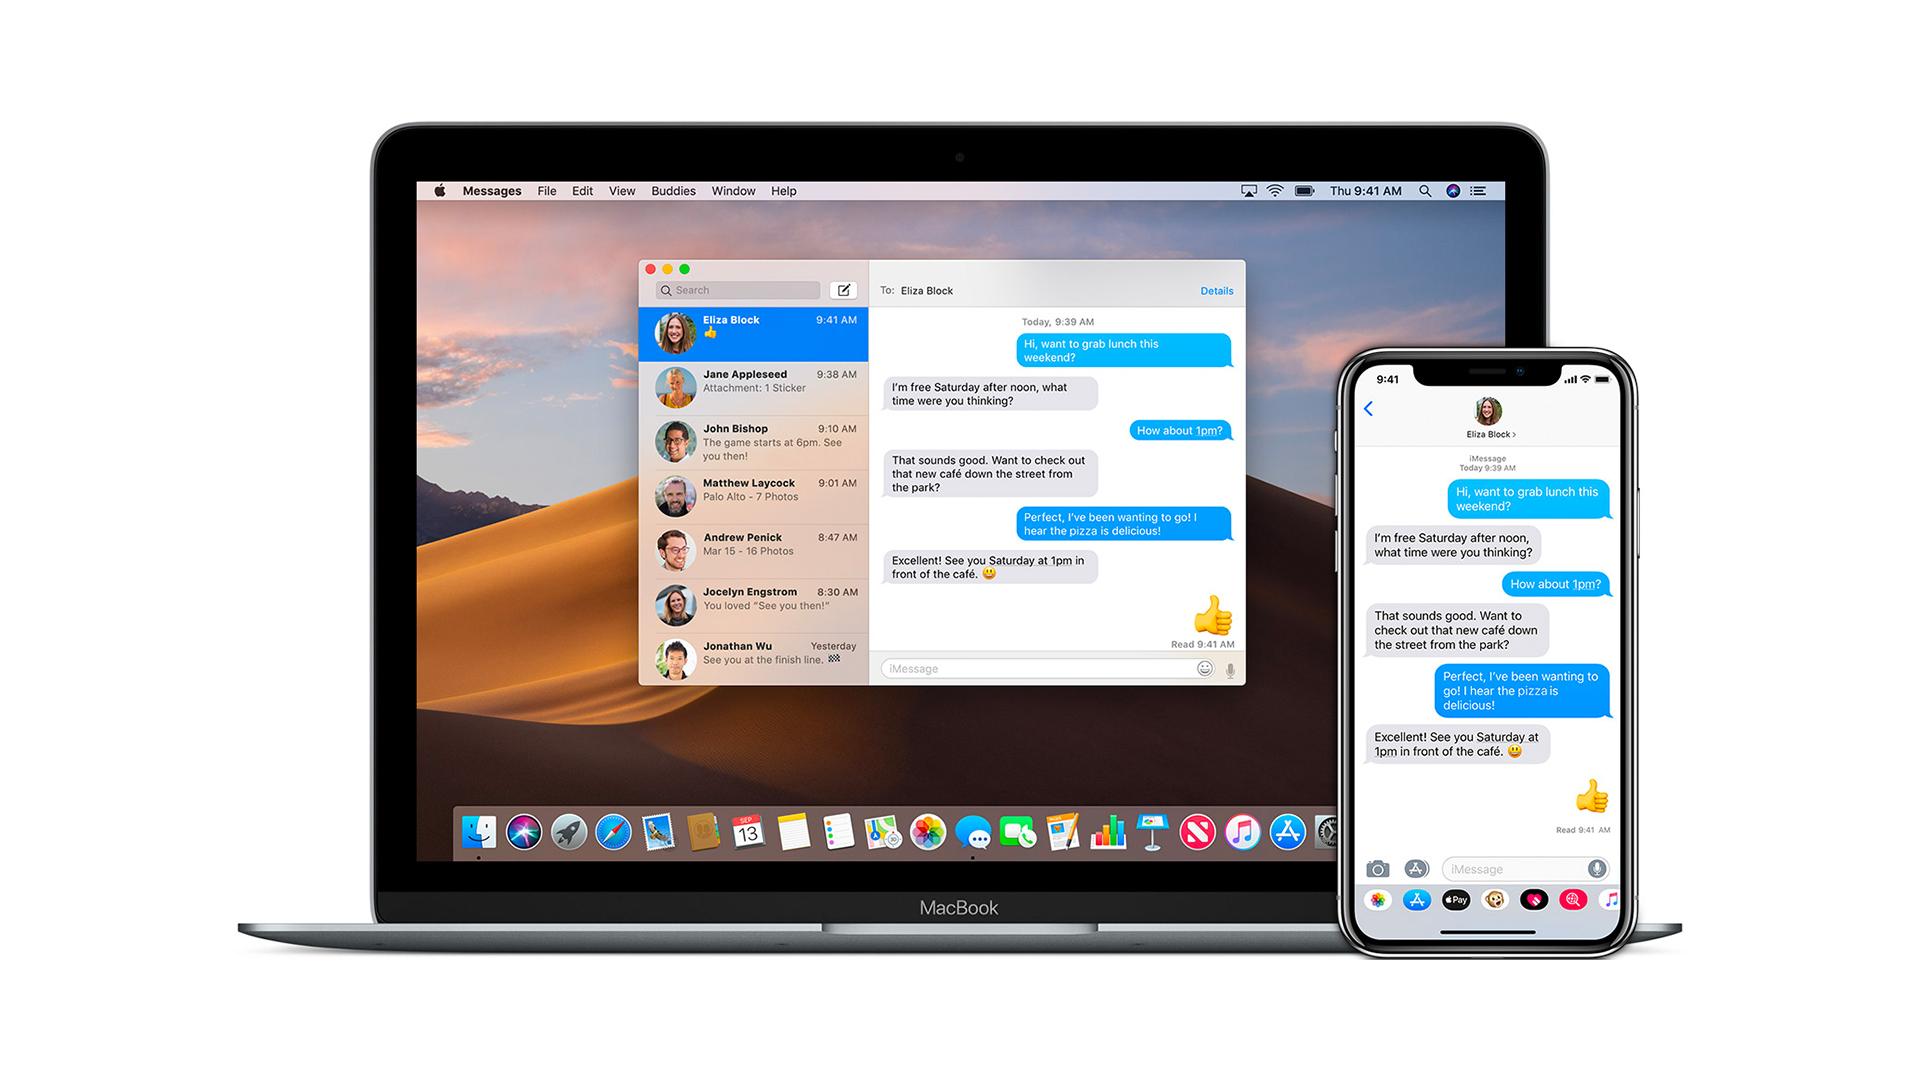 8068e566dab39a512e4dabdecba28138 - How To Get The Messages App On Your Mac